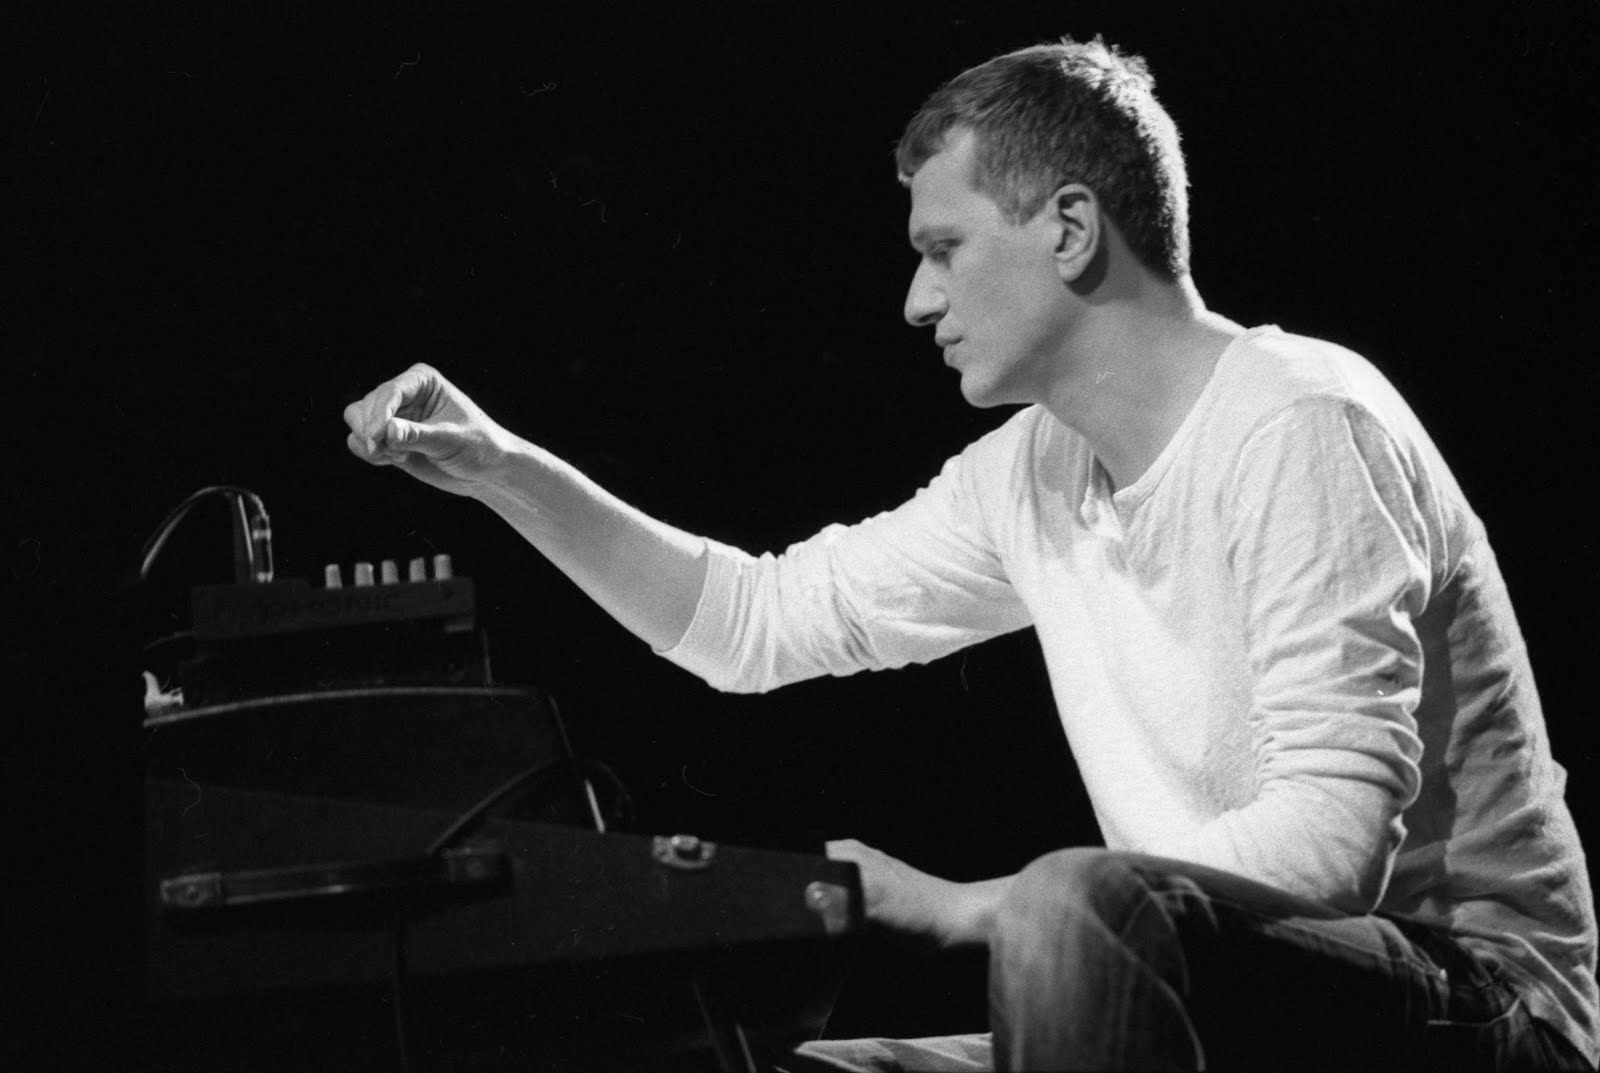 http://4.bp.blogspot.com/-RNiAsW8U_1A/UJZcRt5FA3I/AAAAAAAAAuw/MUiv5yAwcjA/s1600/pianiste%2Bfender027.jpg